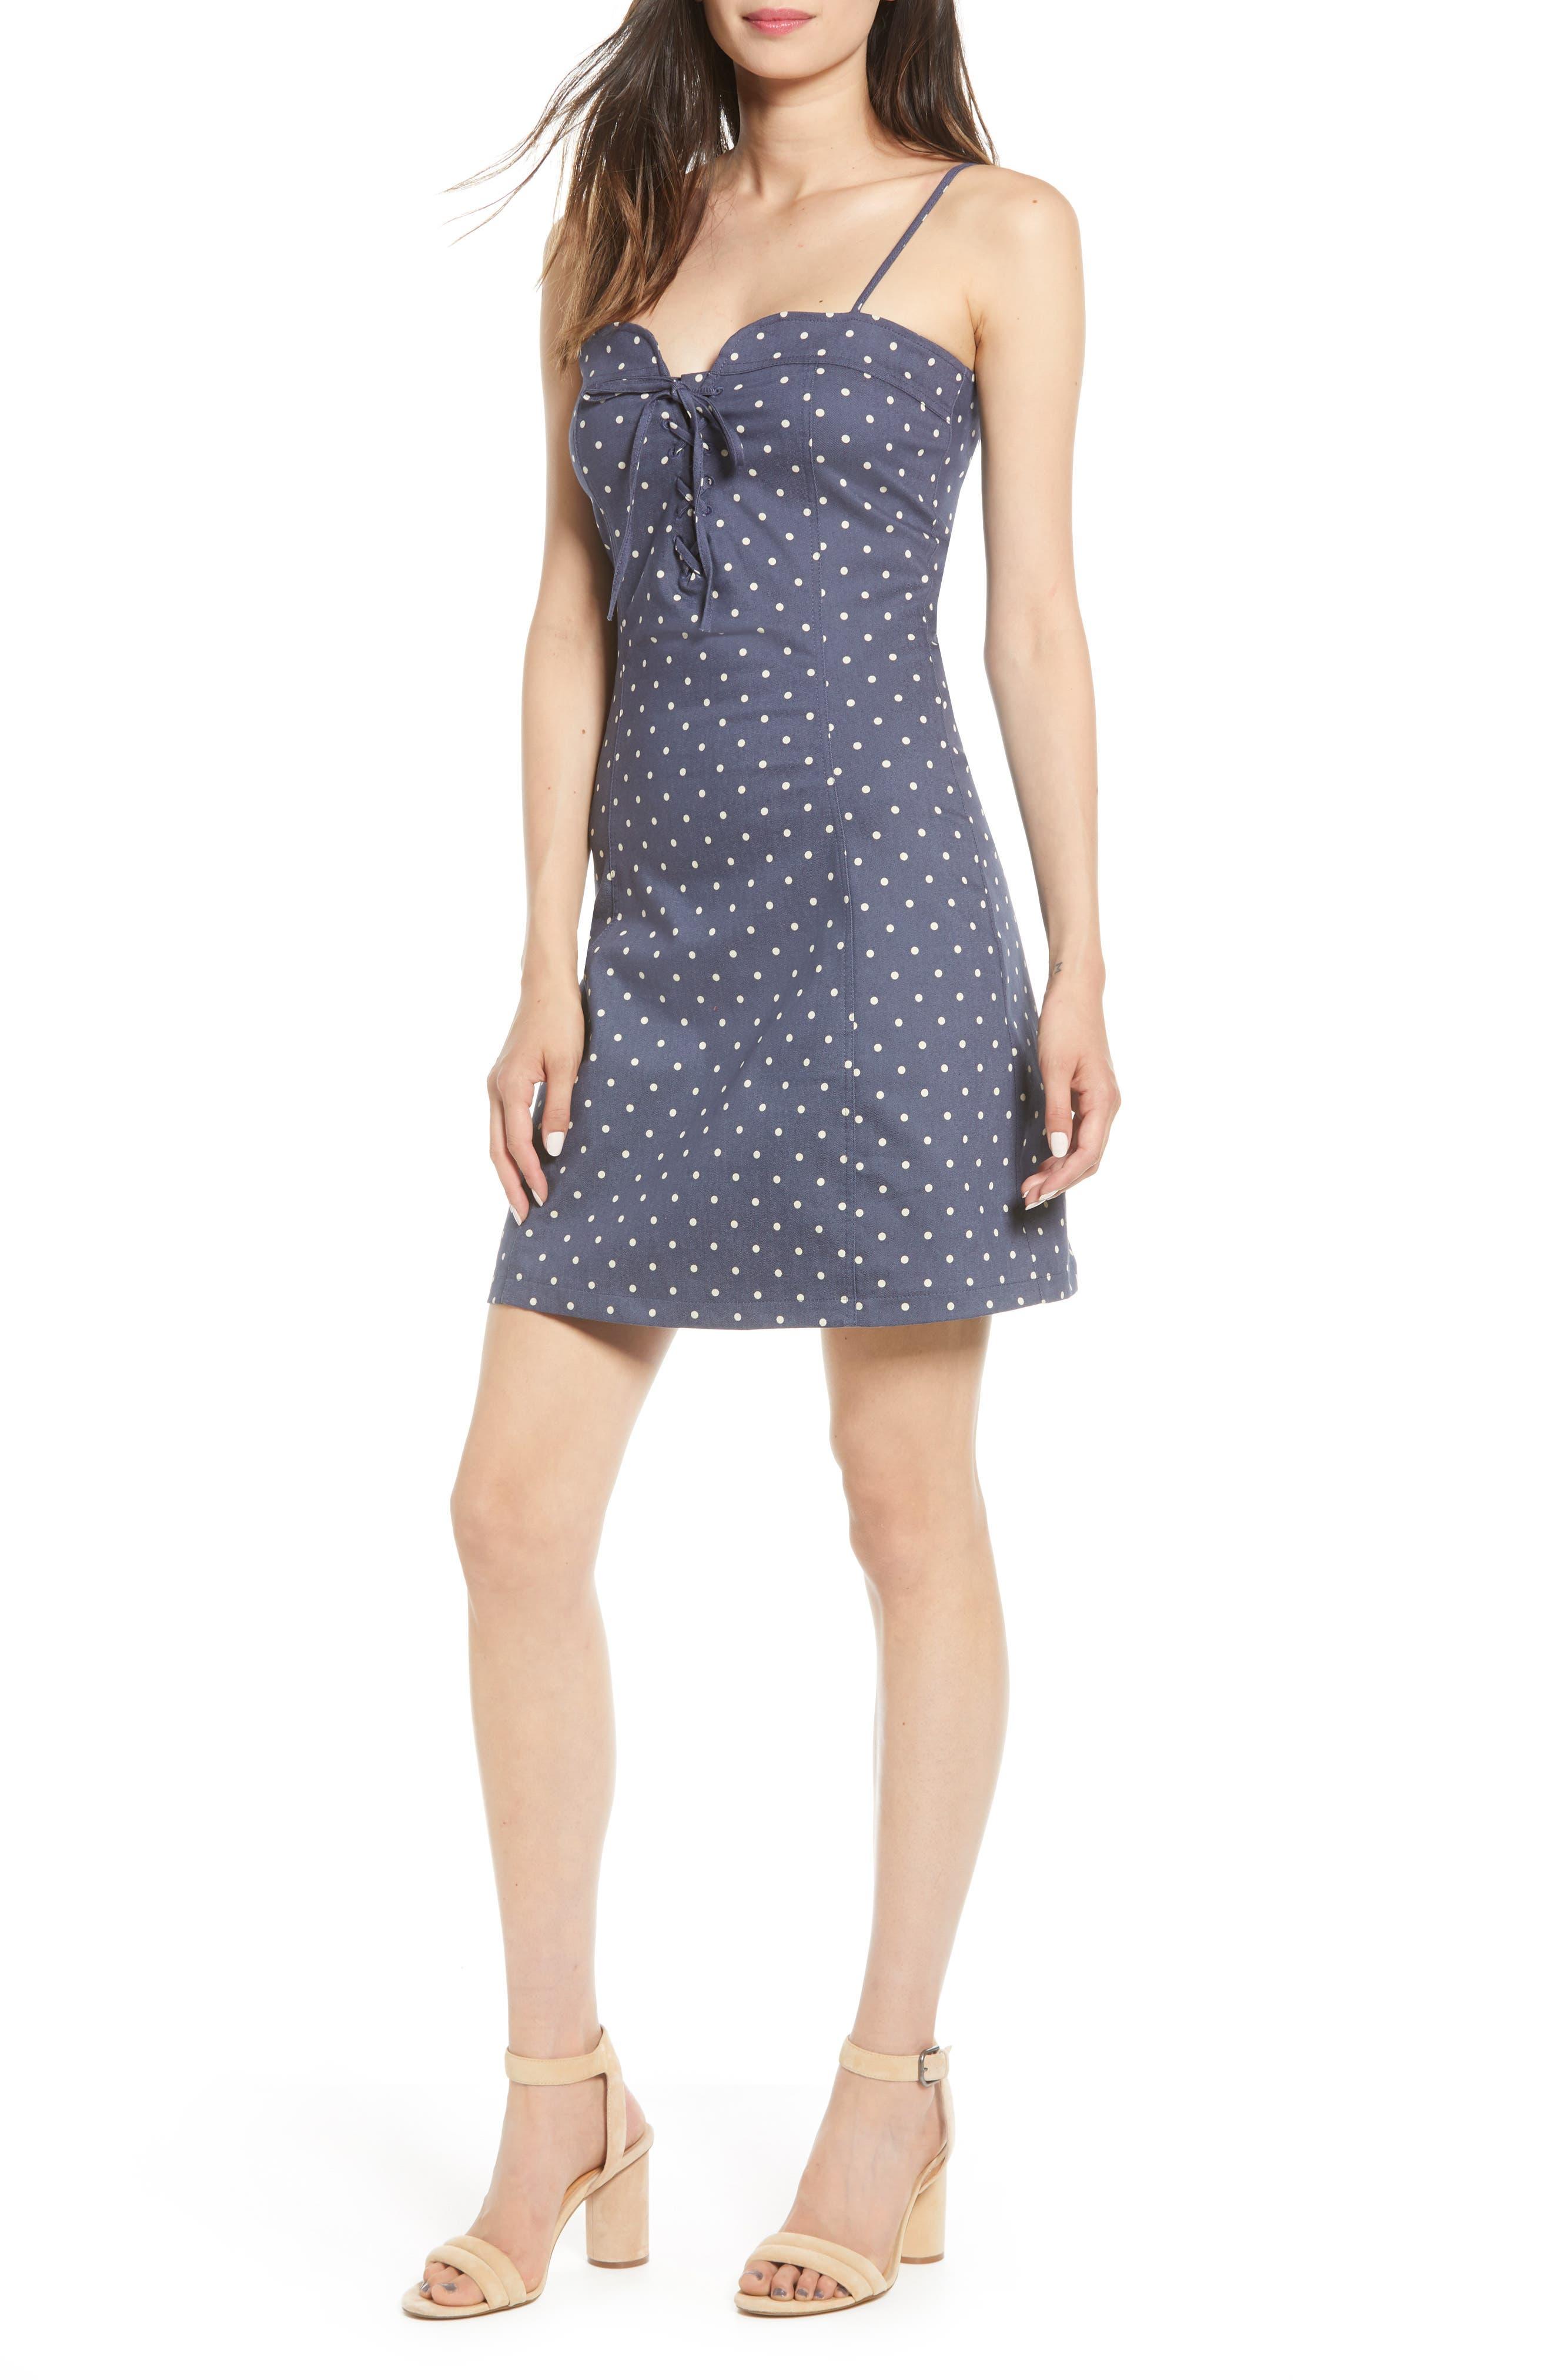 Bishop + Young Polka Dot Lace-Up Cotton Dress, Blue